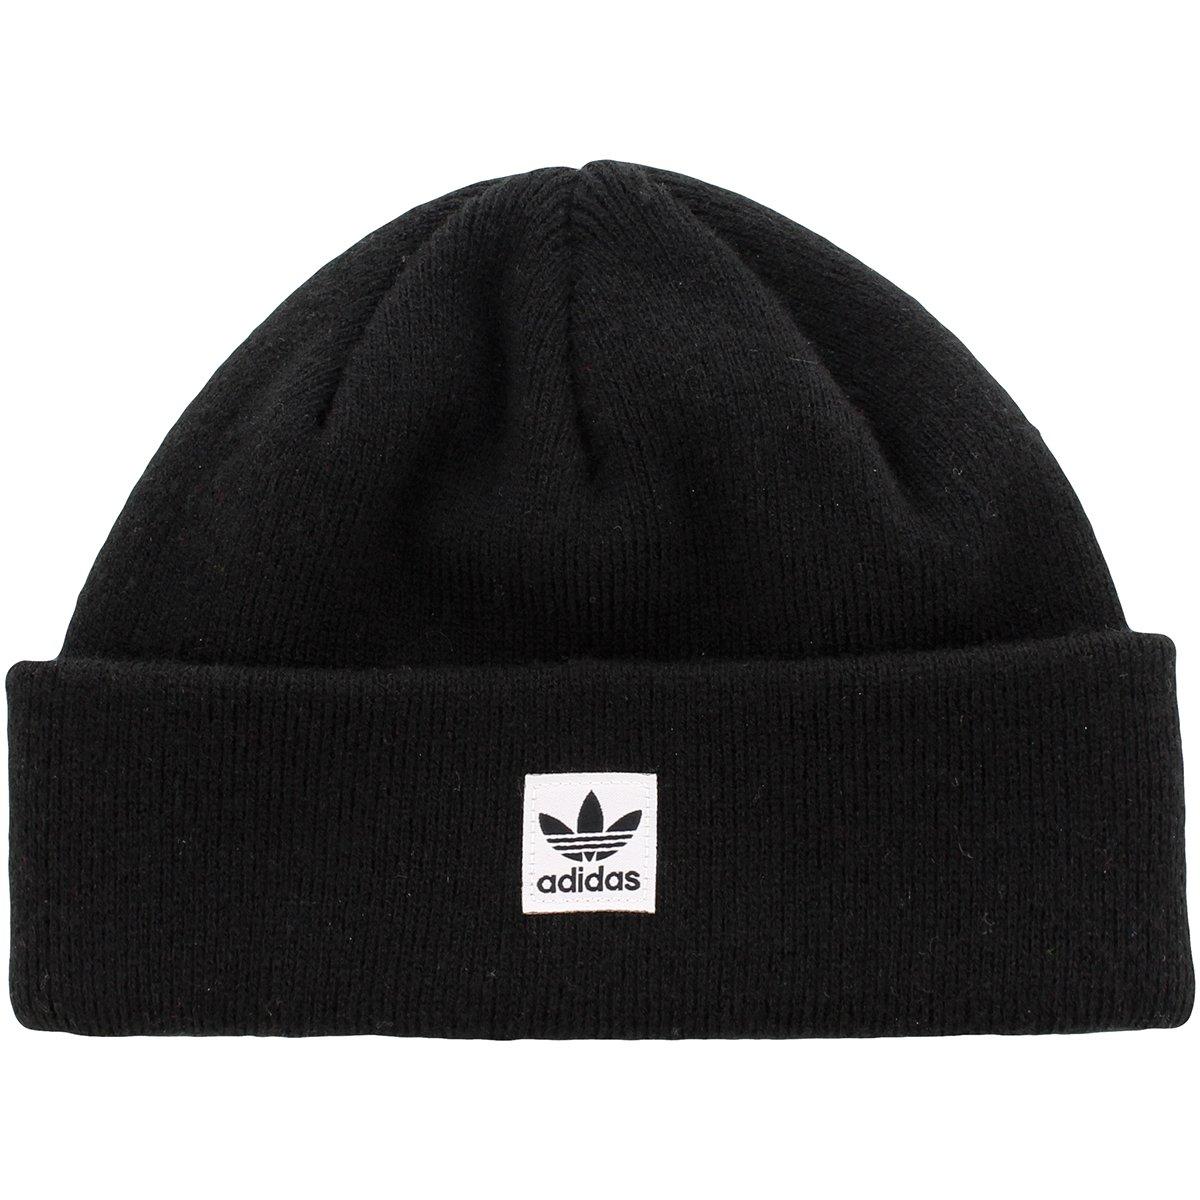 Amazon.com  Adidas Men s Originals Starboard Knit Beanie 69cac2be5f1